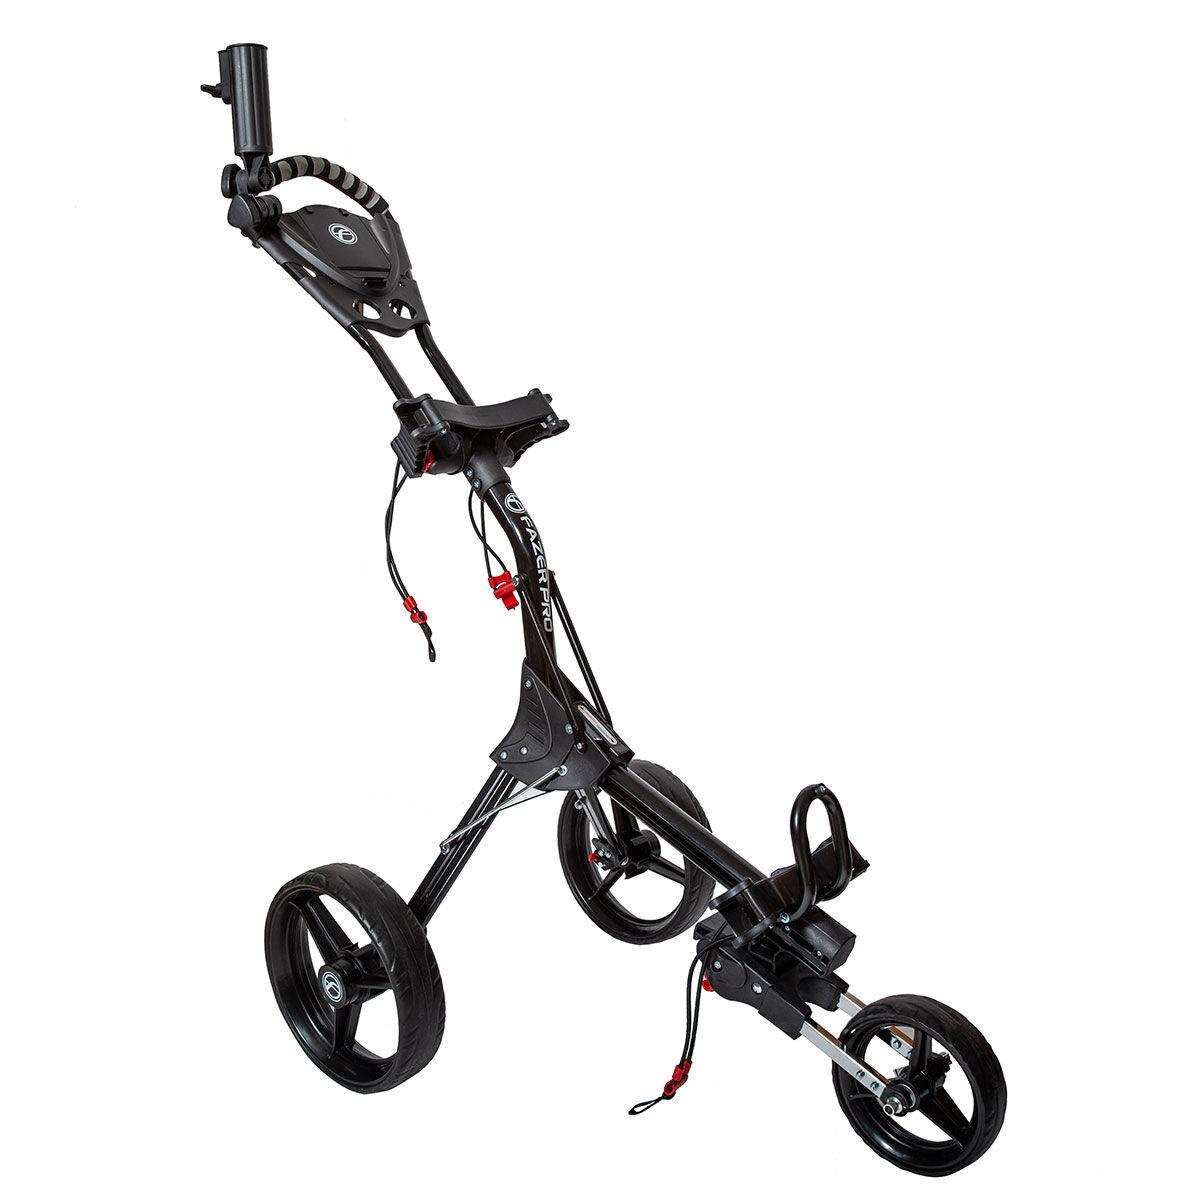 Fazer Pro Compact Push Golf Trolley, Black, One Size | American Golf